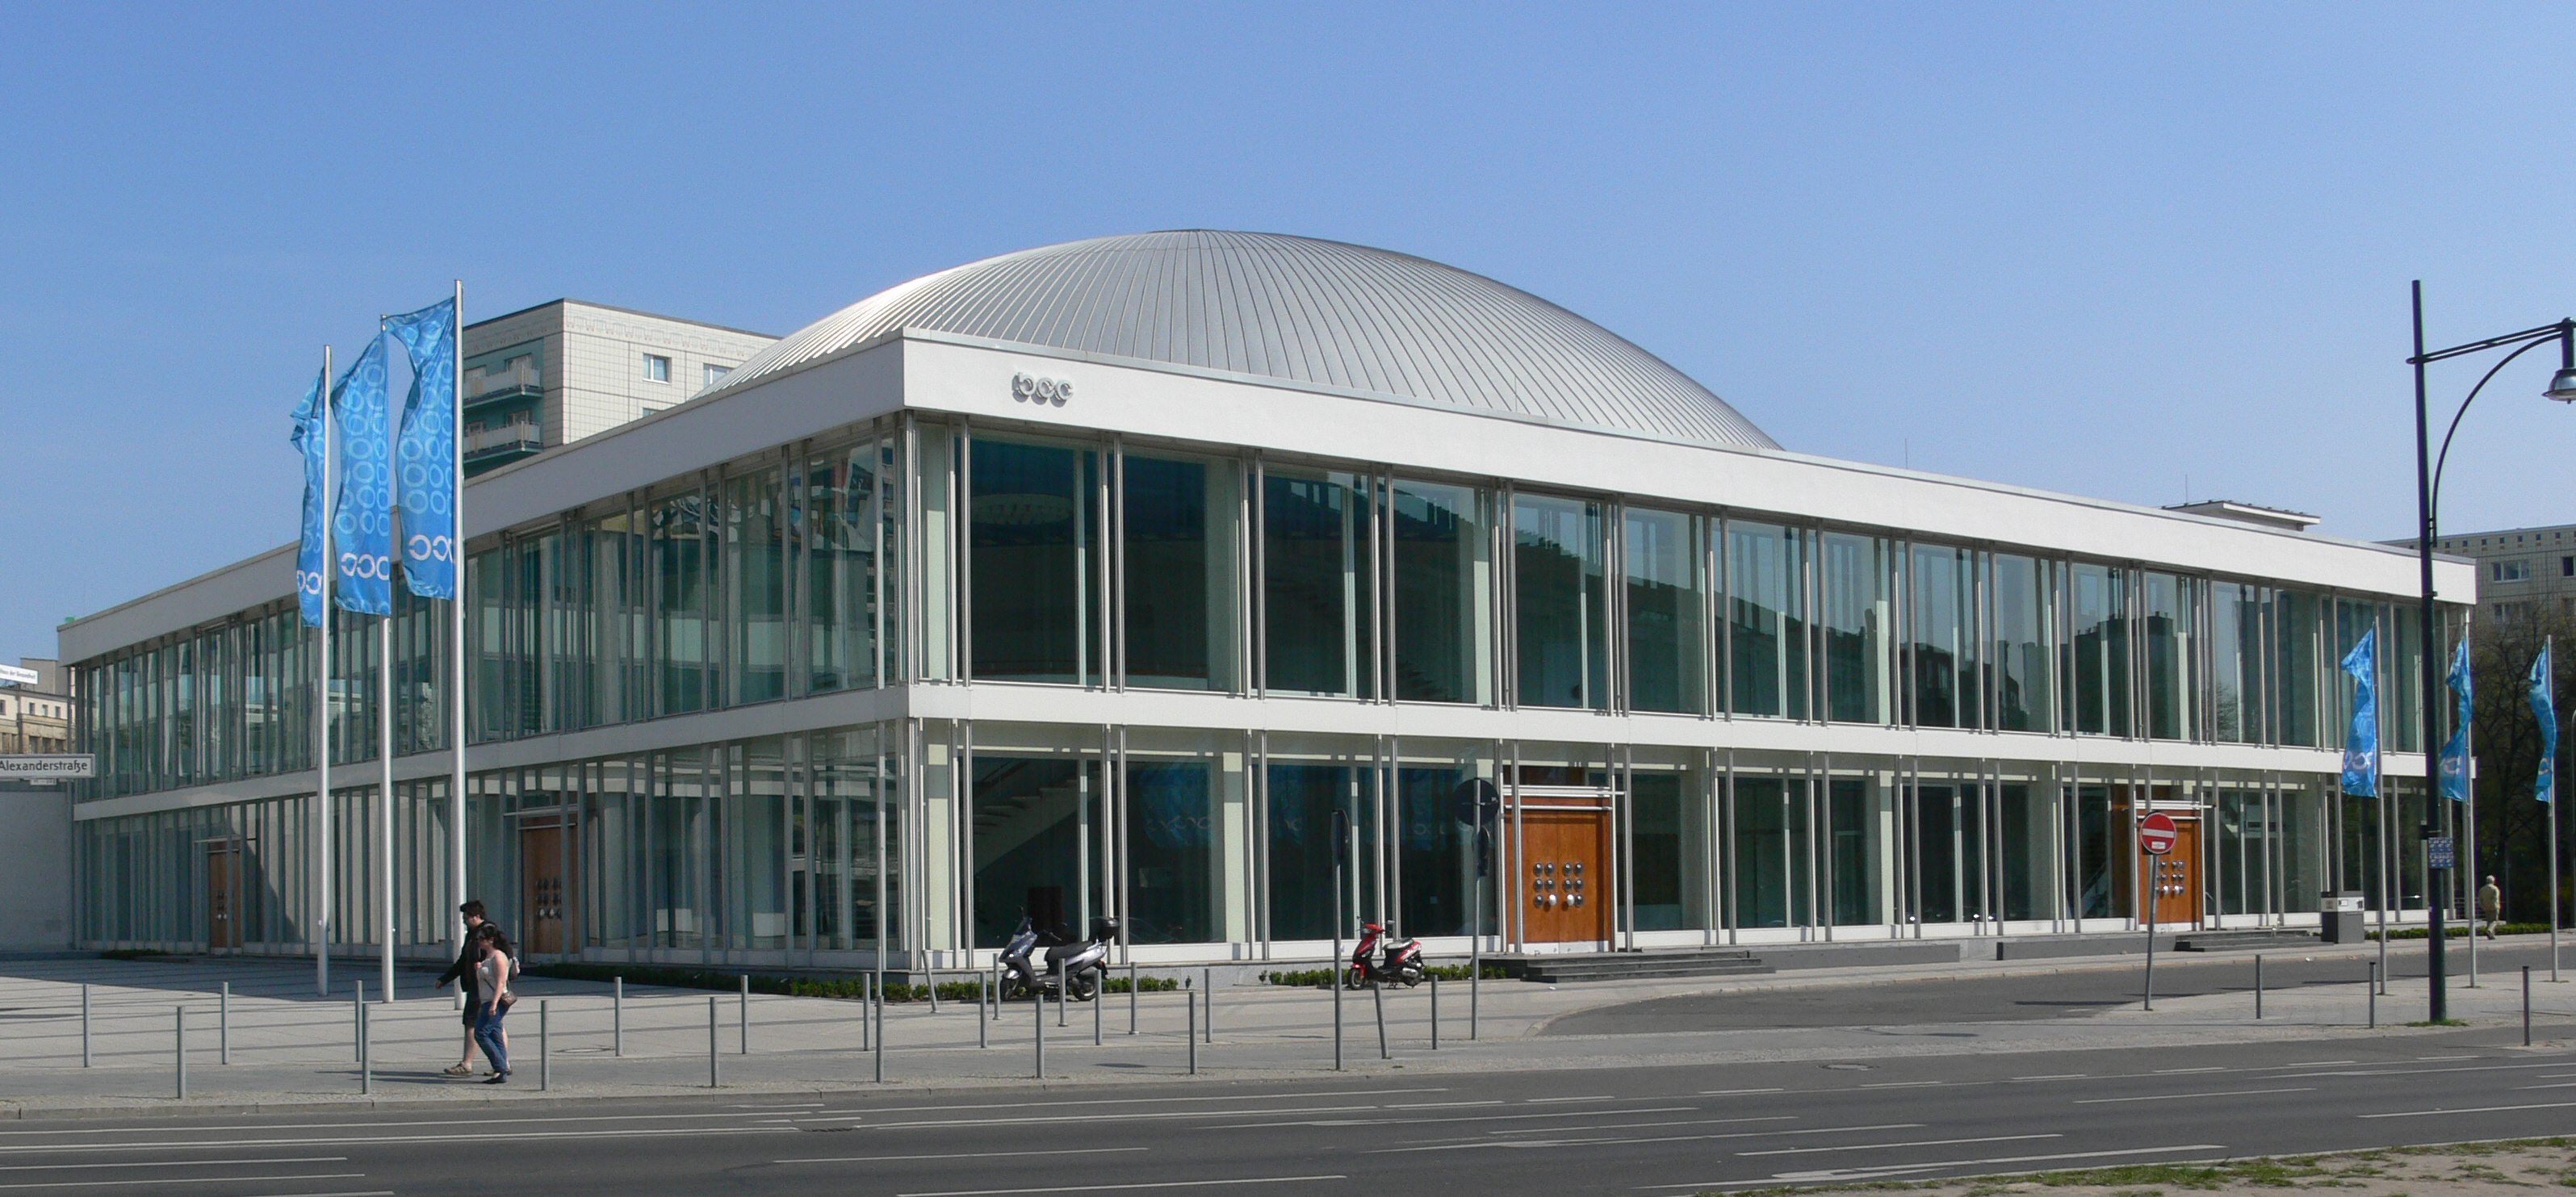 File:Berlin bcc Kongresshalle.jpg - Wikimedia Commons